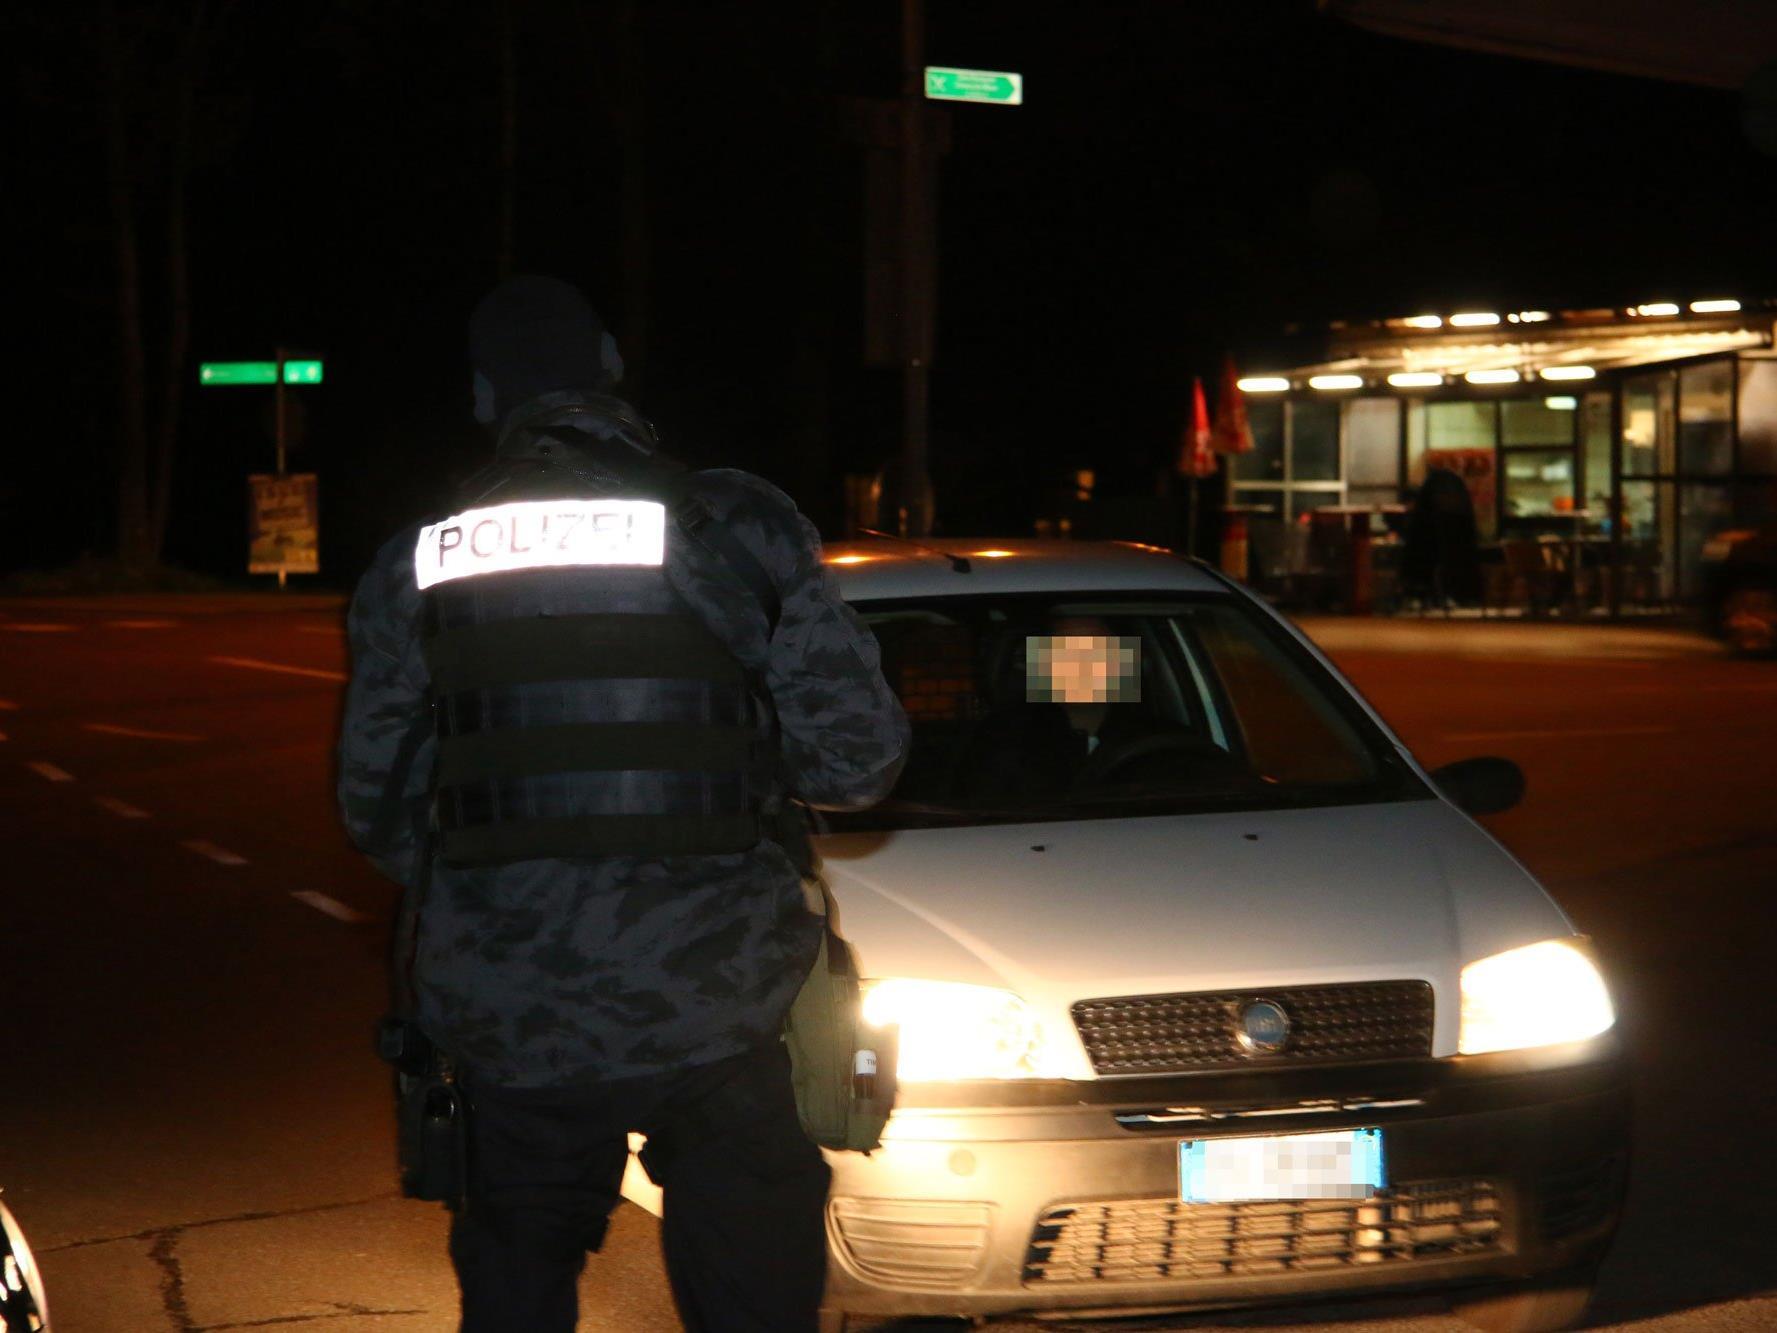 Im Bild: Alarmfahndung nach bewaffnetem Raubüberfall in Lindau.